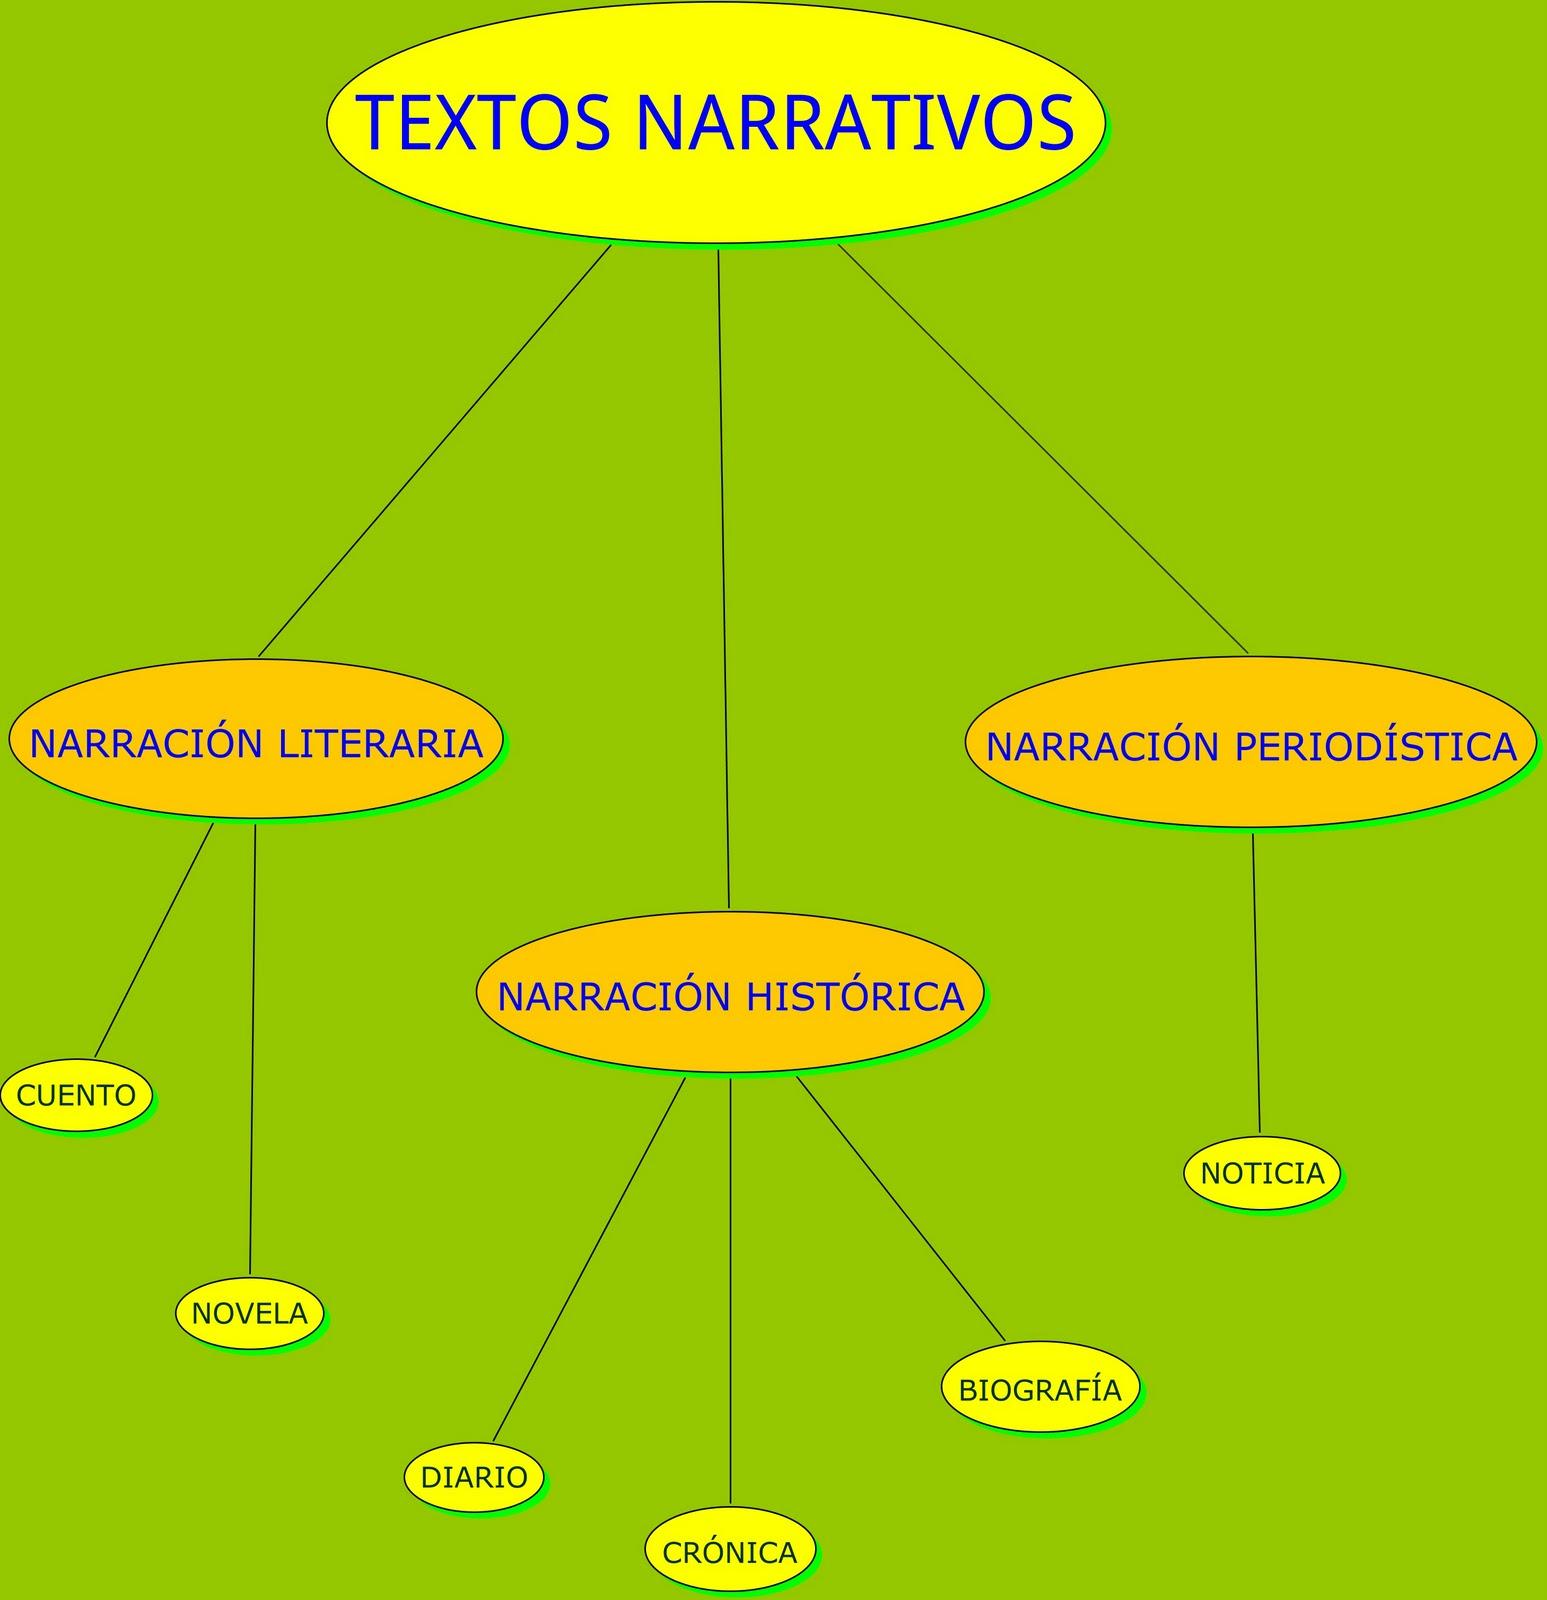 Lengua El Esquema Los Textos Narrativos Ejemplos Para El